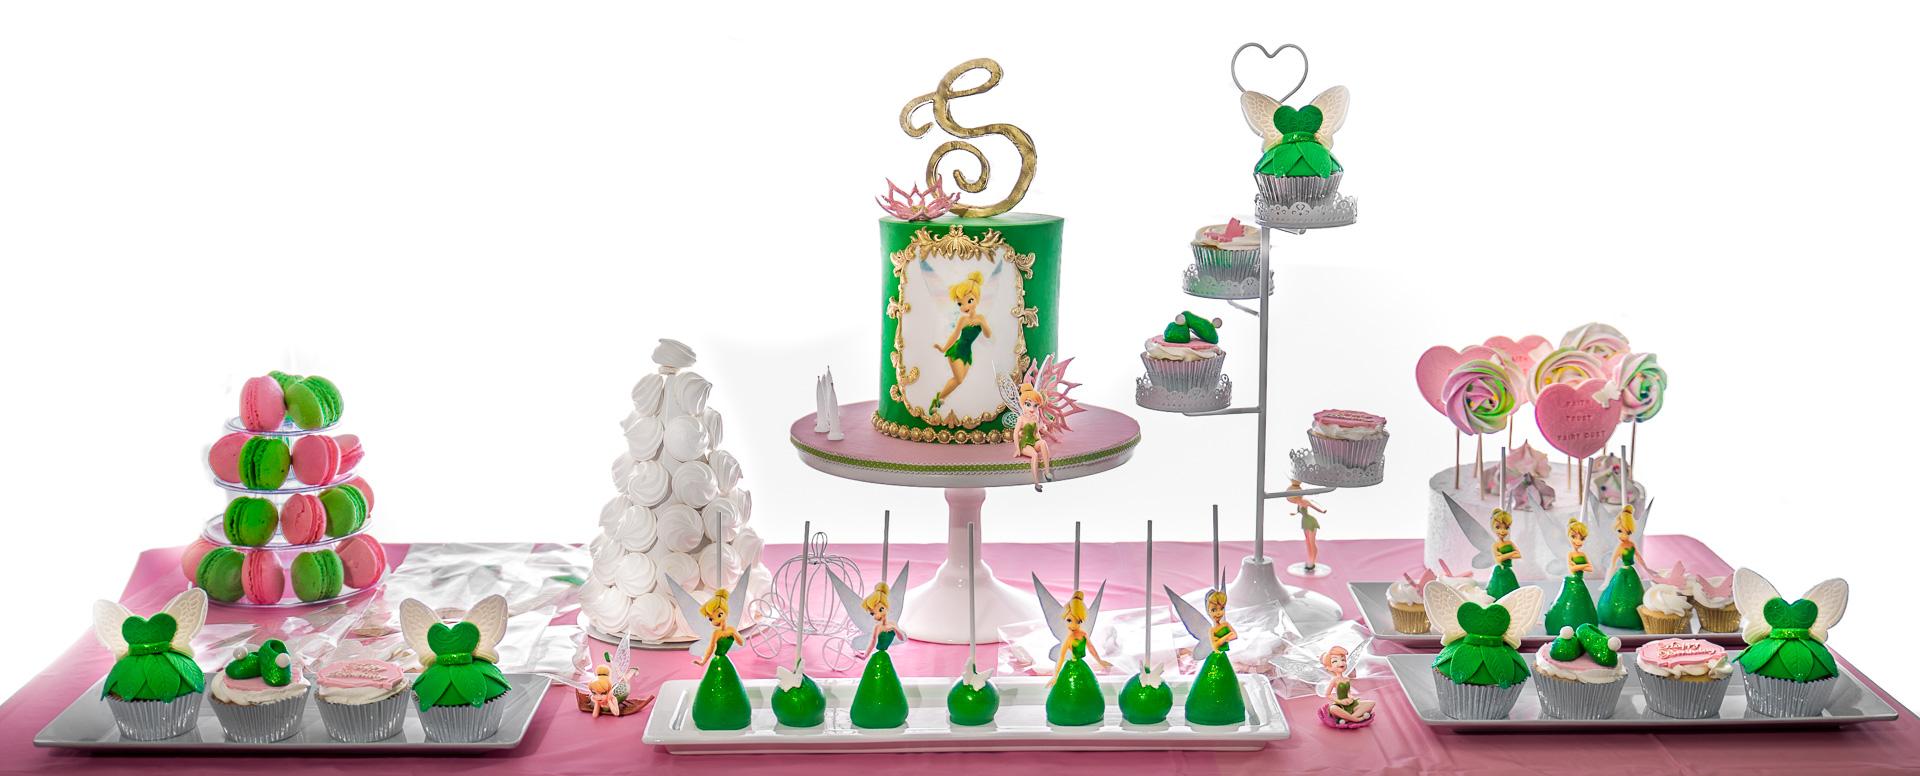 Tinkerbell-Dessert-Table-Birthday-Cake.jpg